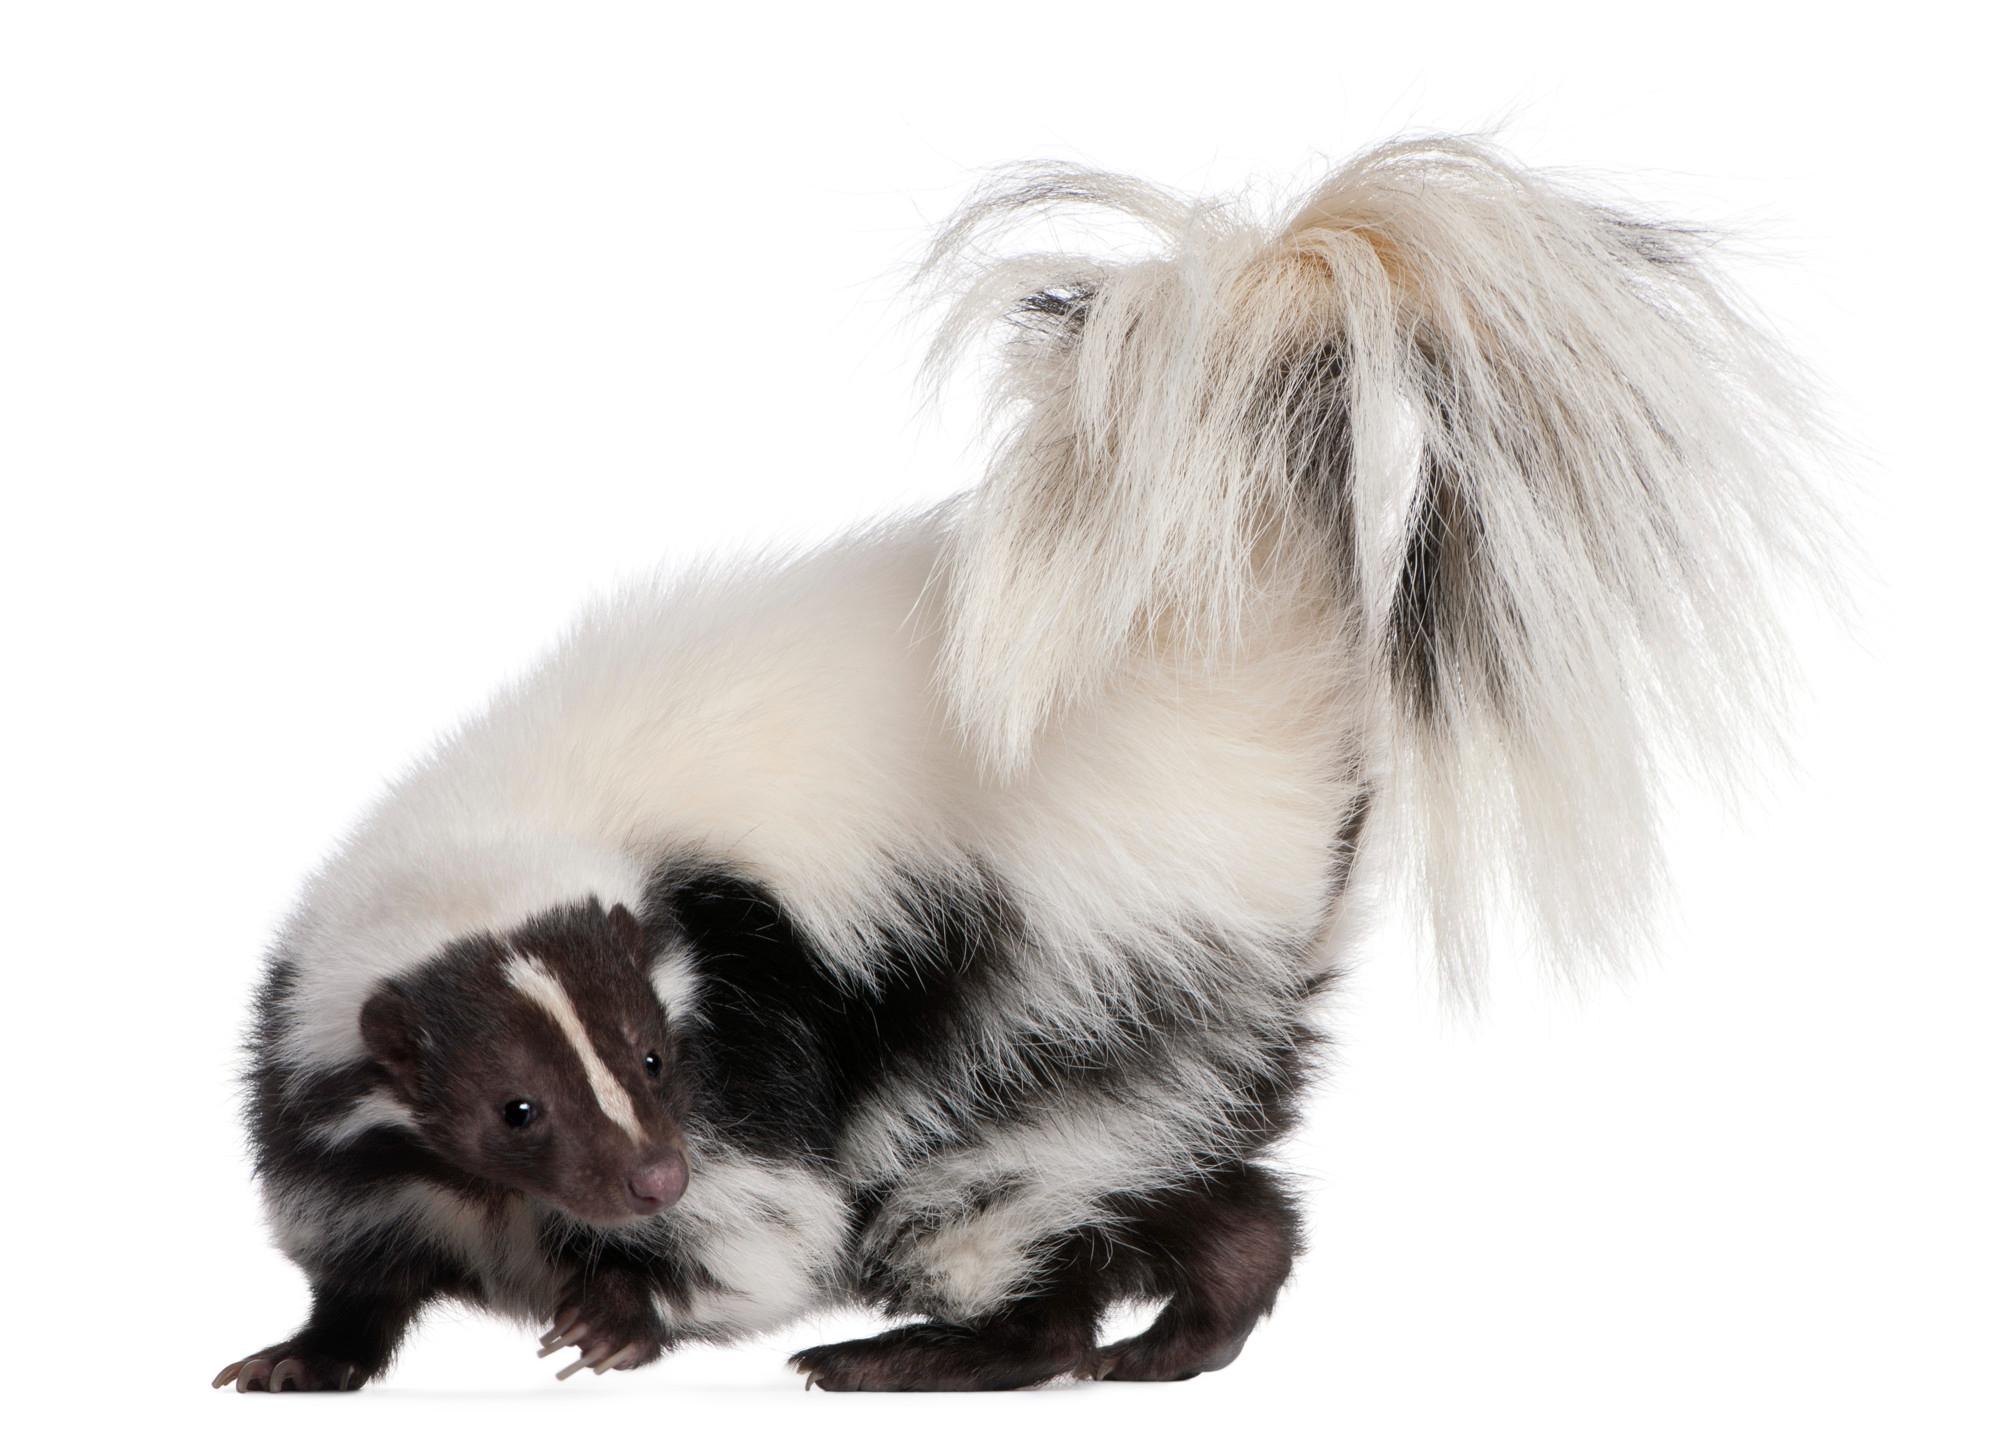 Skunk on white background